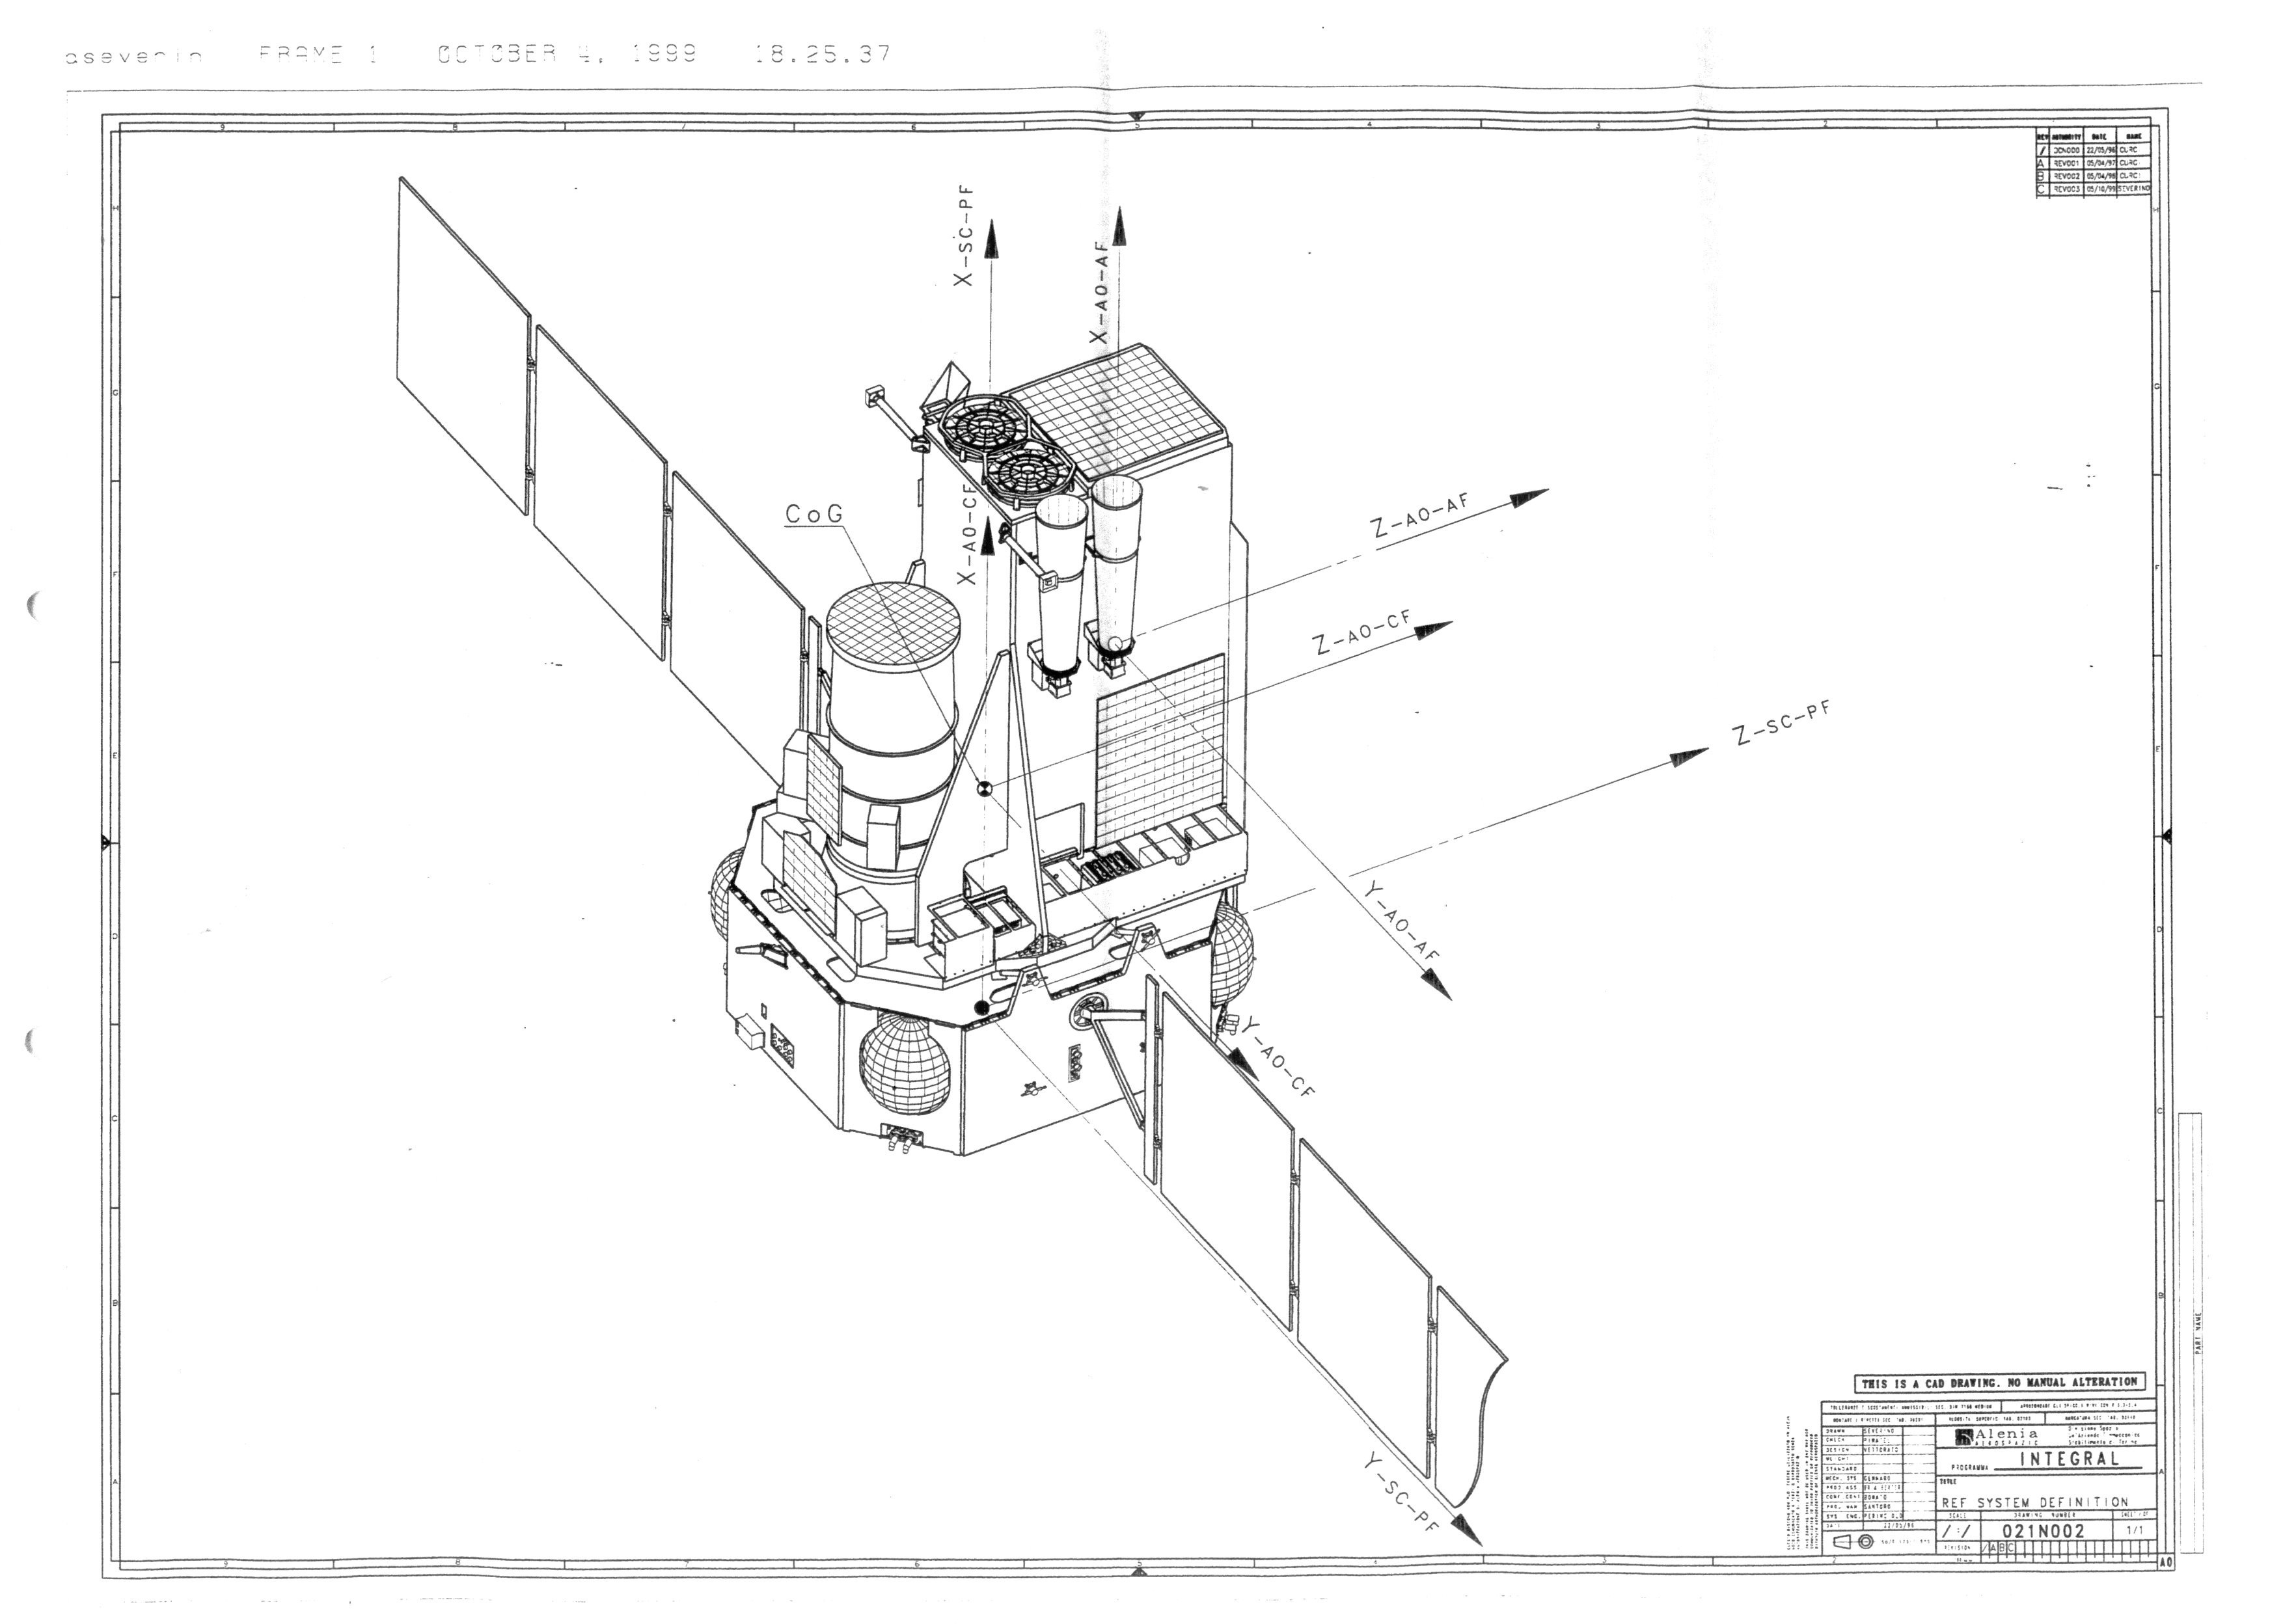 Esa science technology integral blueprint 6 3488 2496 malvernweather Gallery